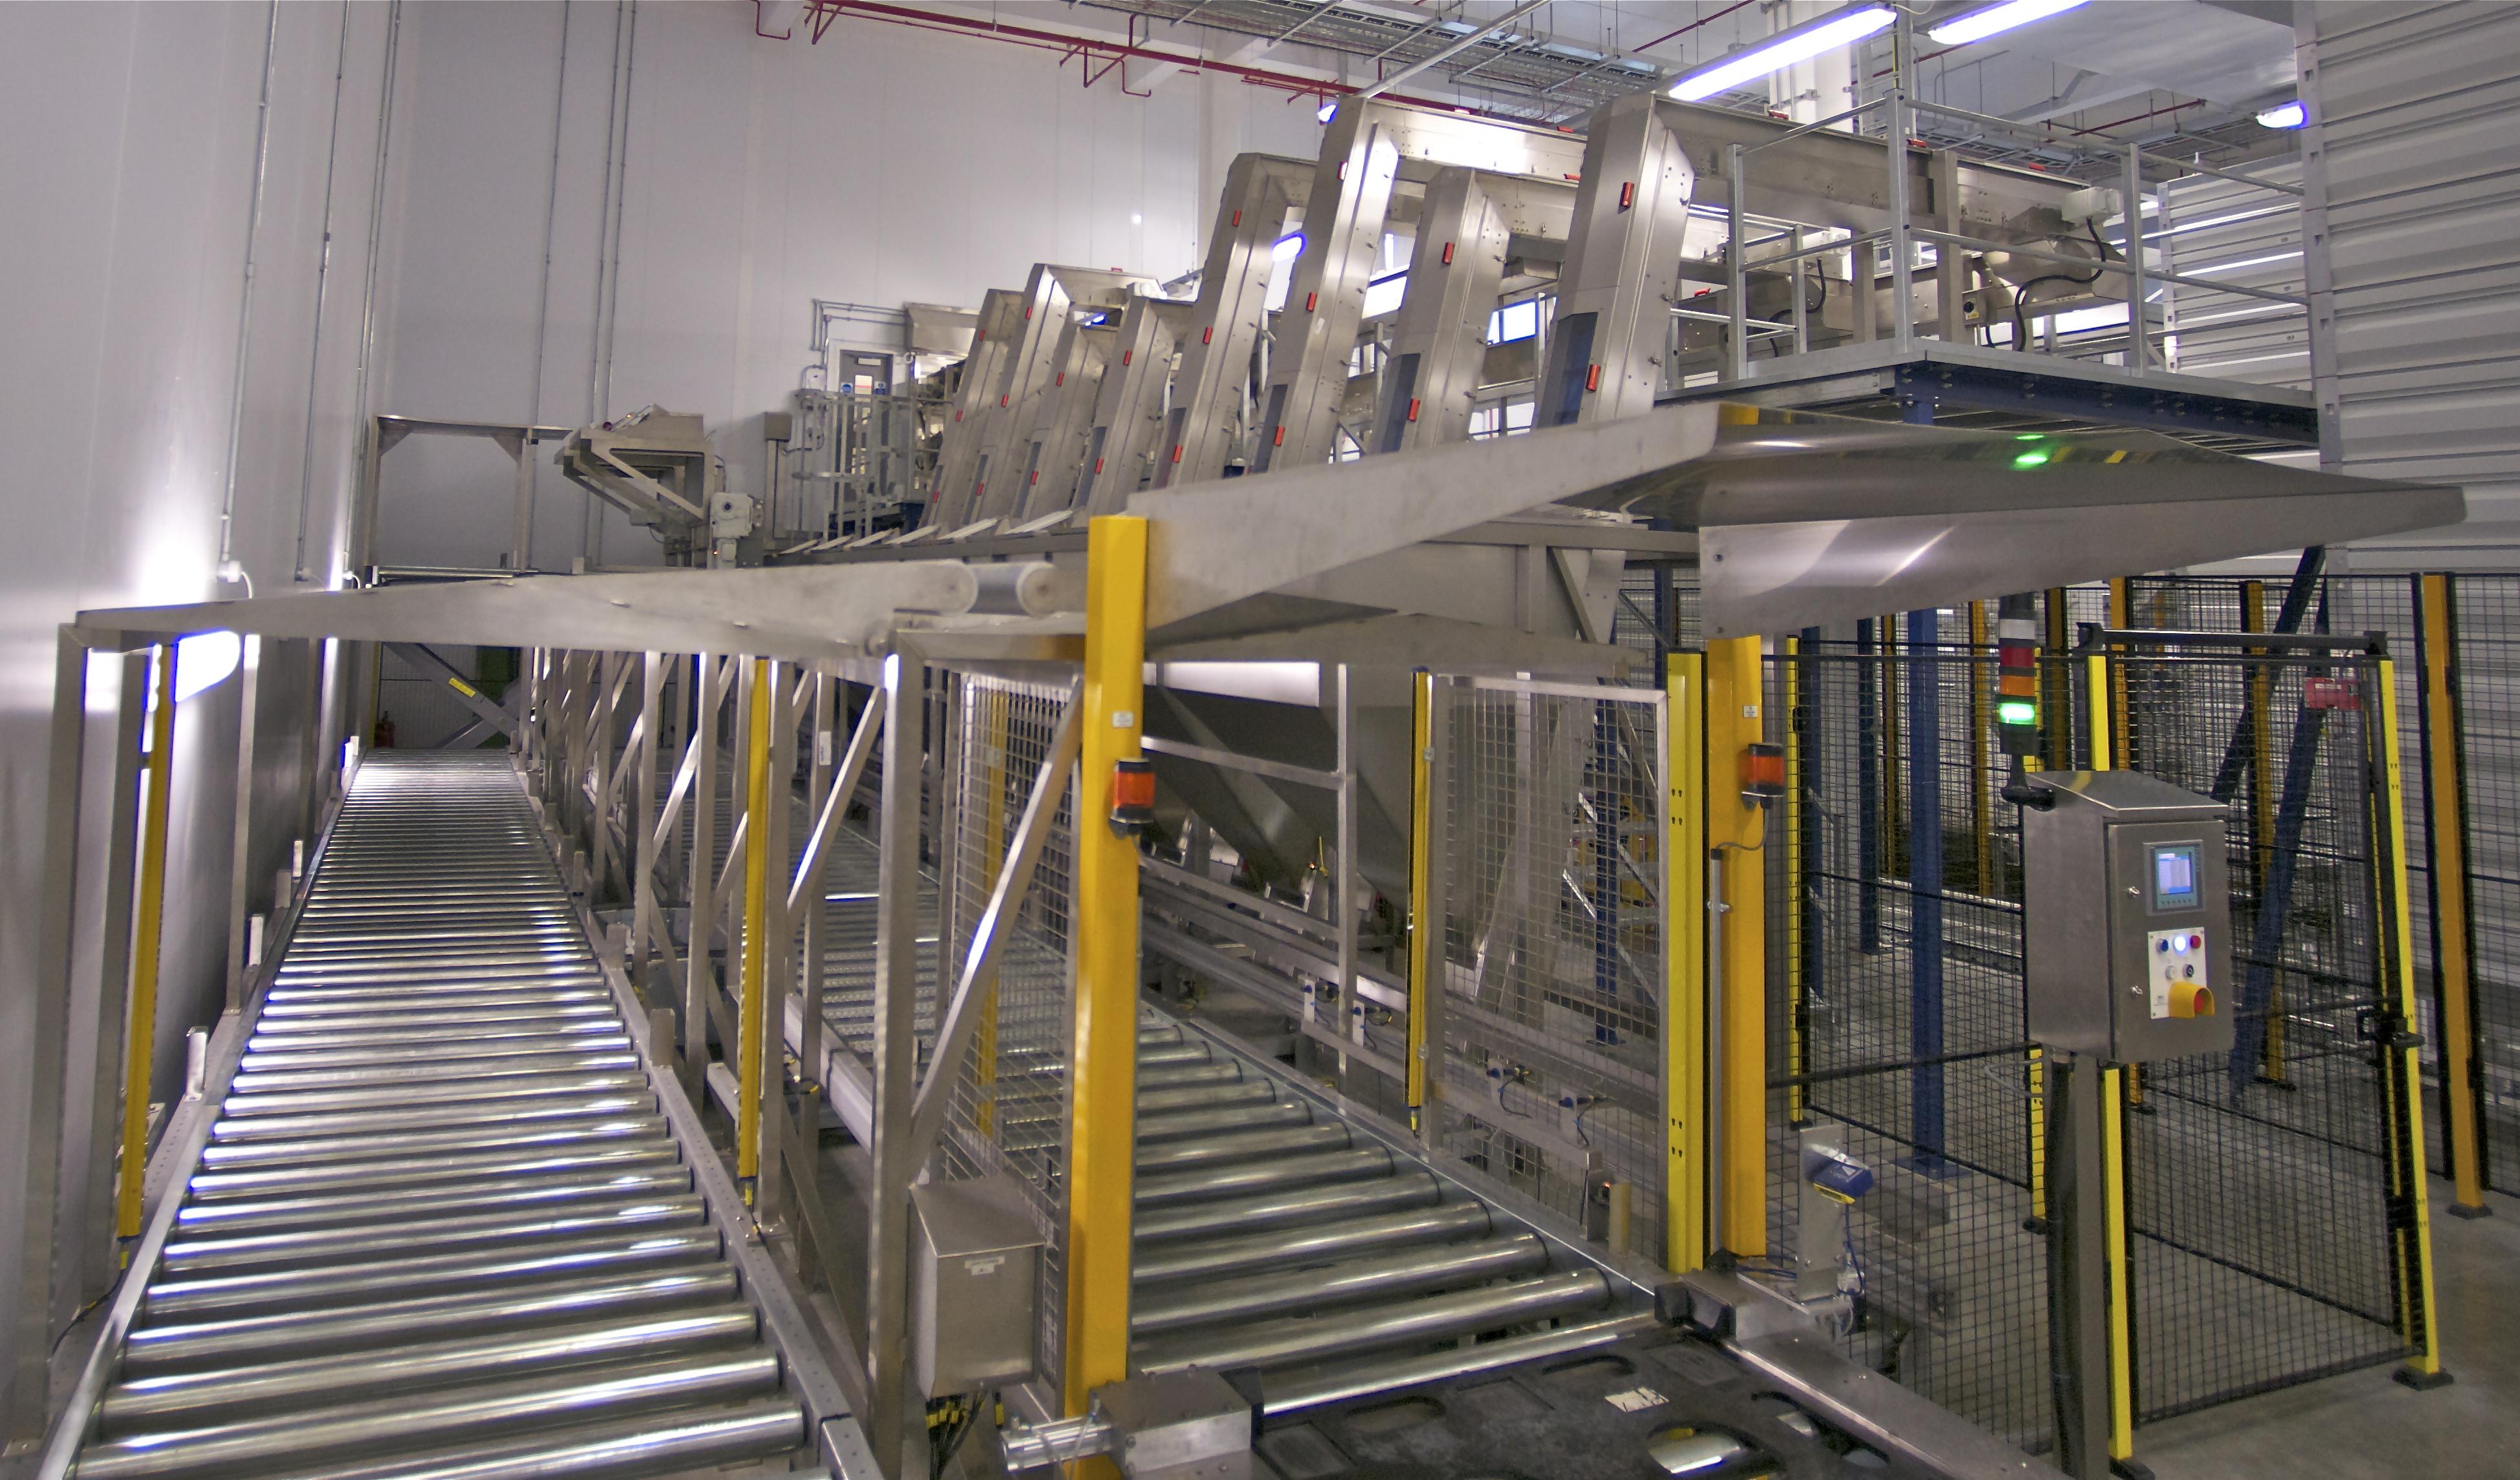 bespoke design of conveyors